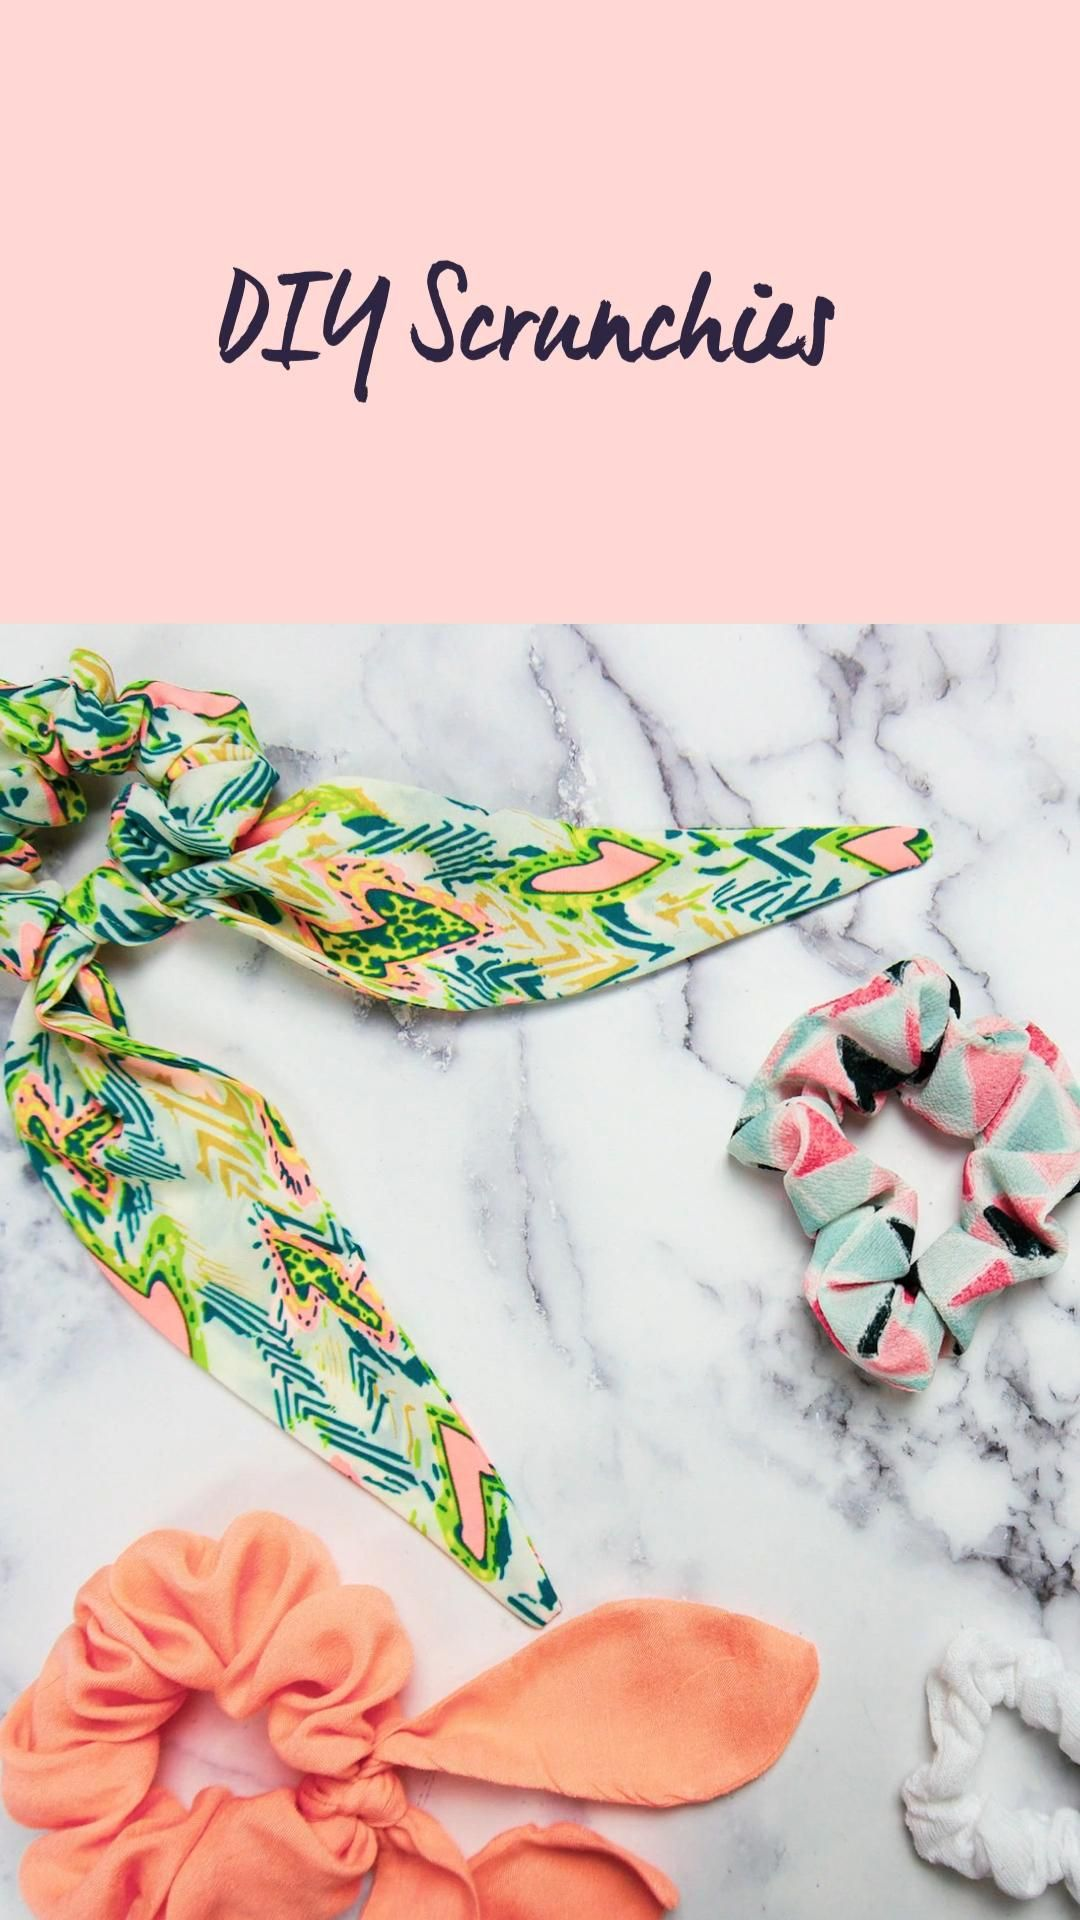 FREE DIY Scrunchies Pattern